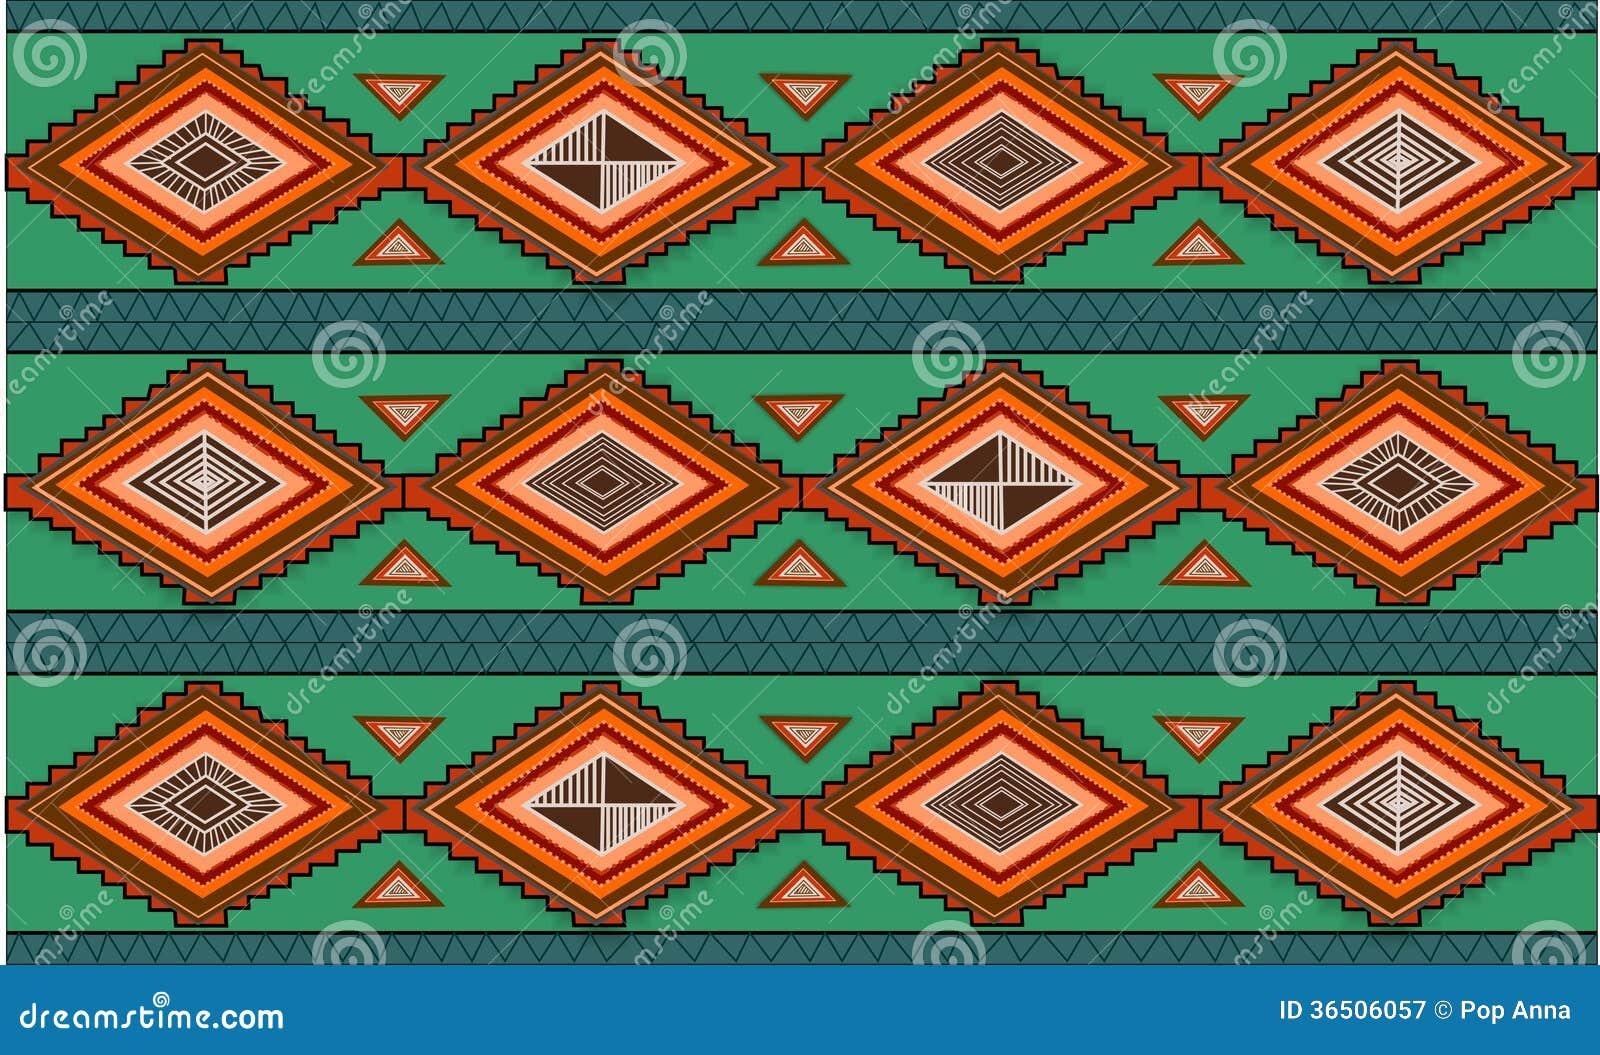 Wunderbar Ikat Muster Ethno Design